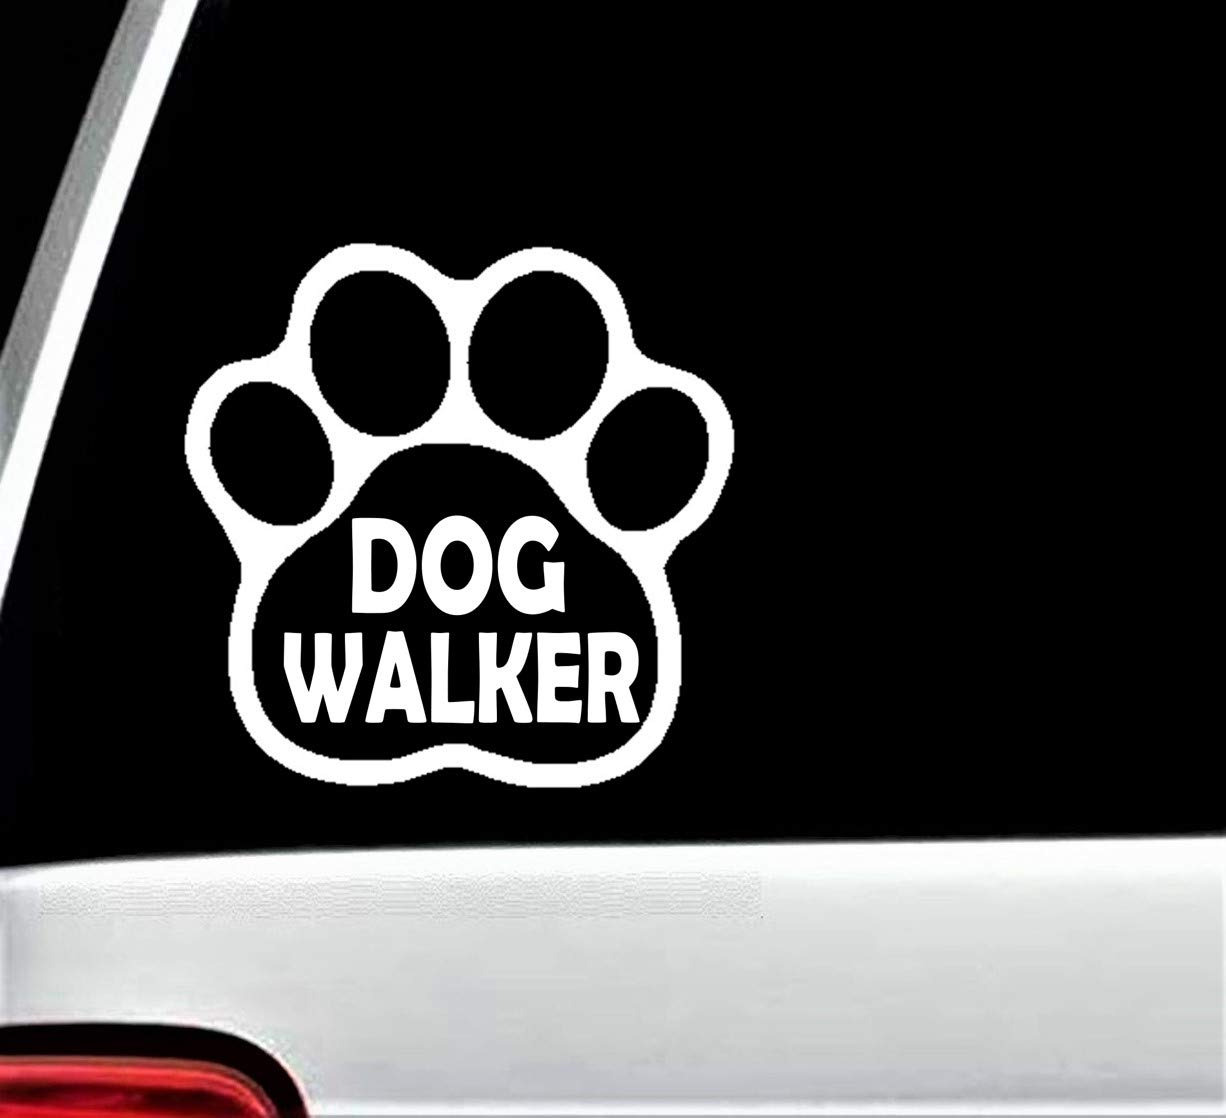 dog walking business vehicle car van vinyl cut decal advertising sticker